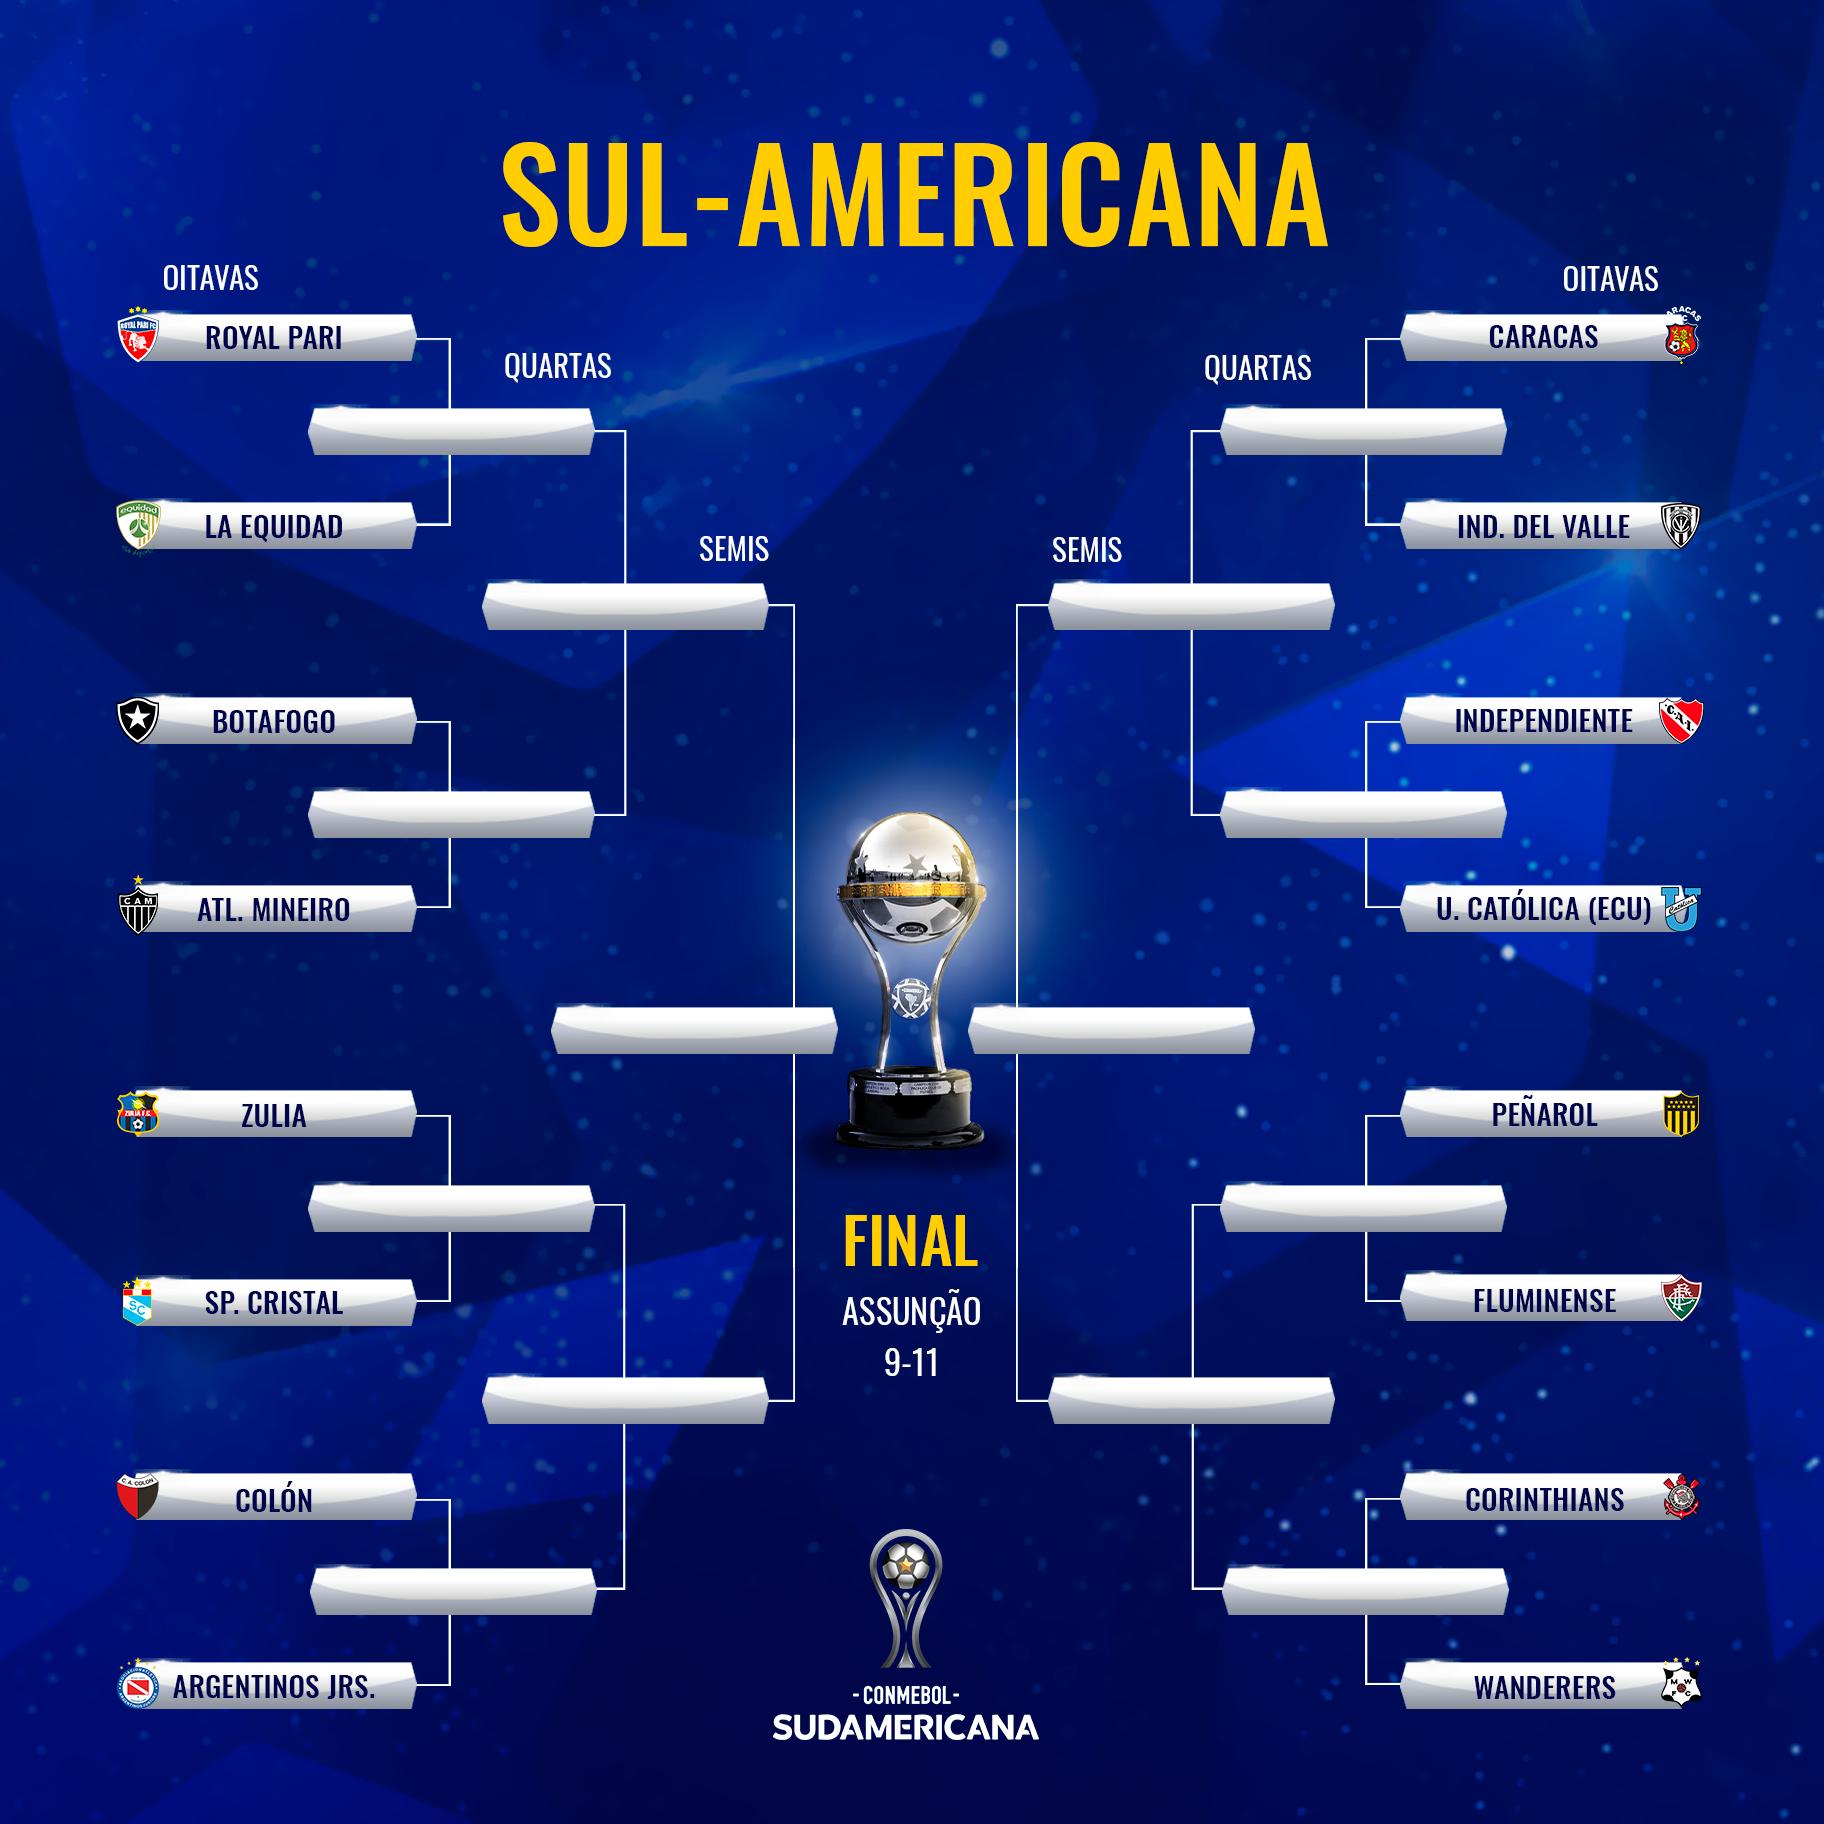 Oitavas de final Copa Sul-Americana 2019